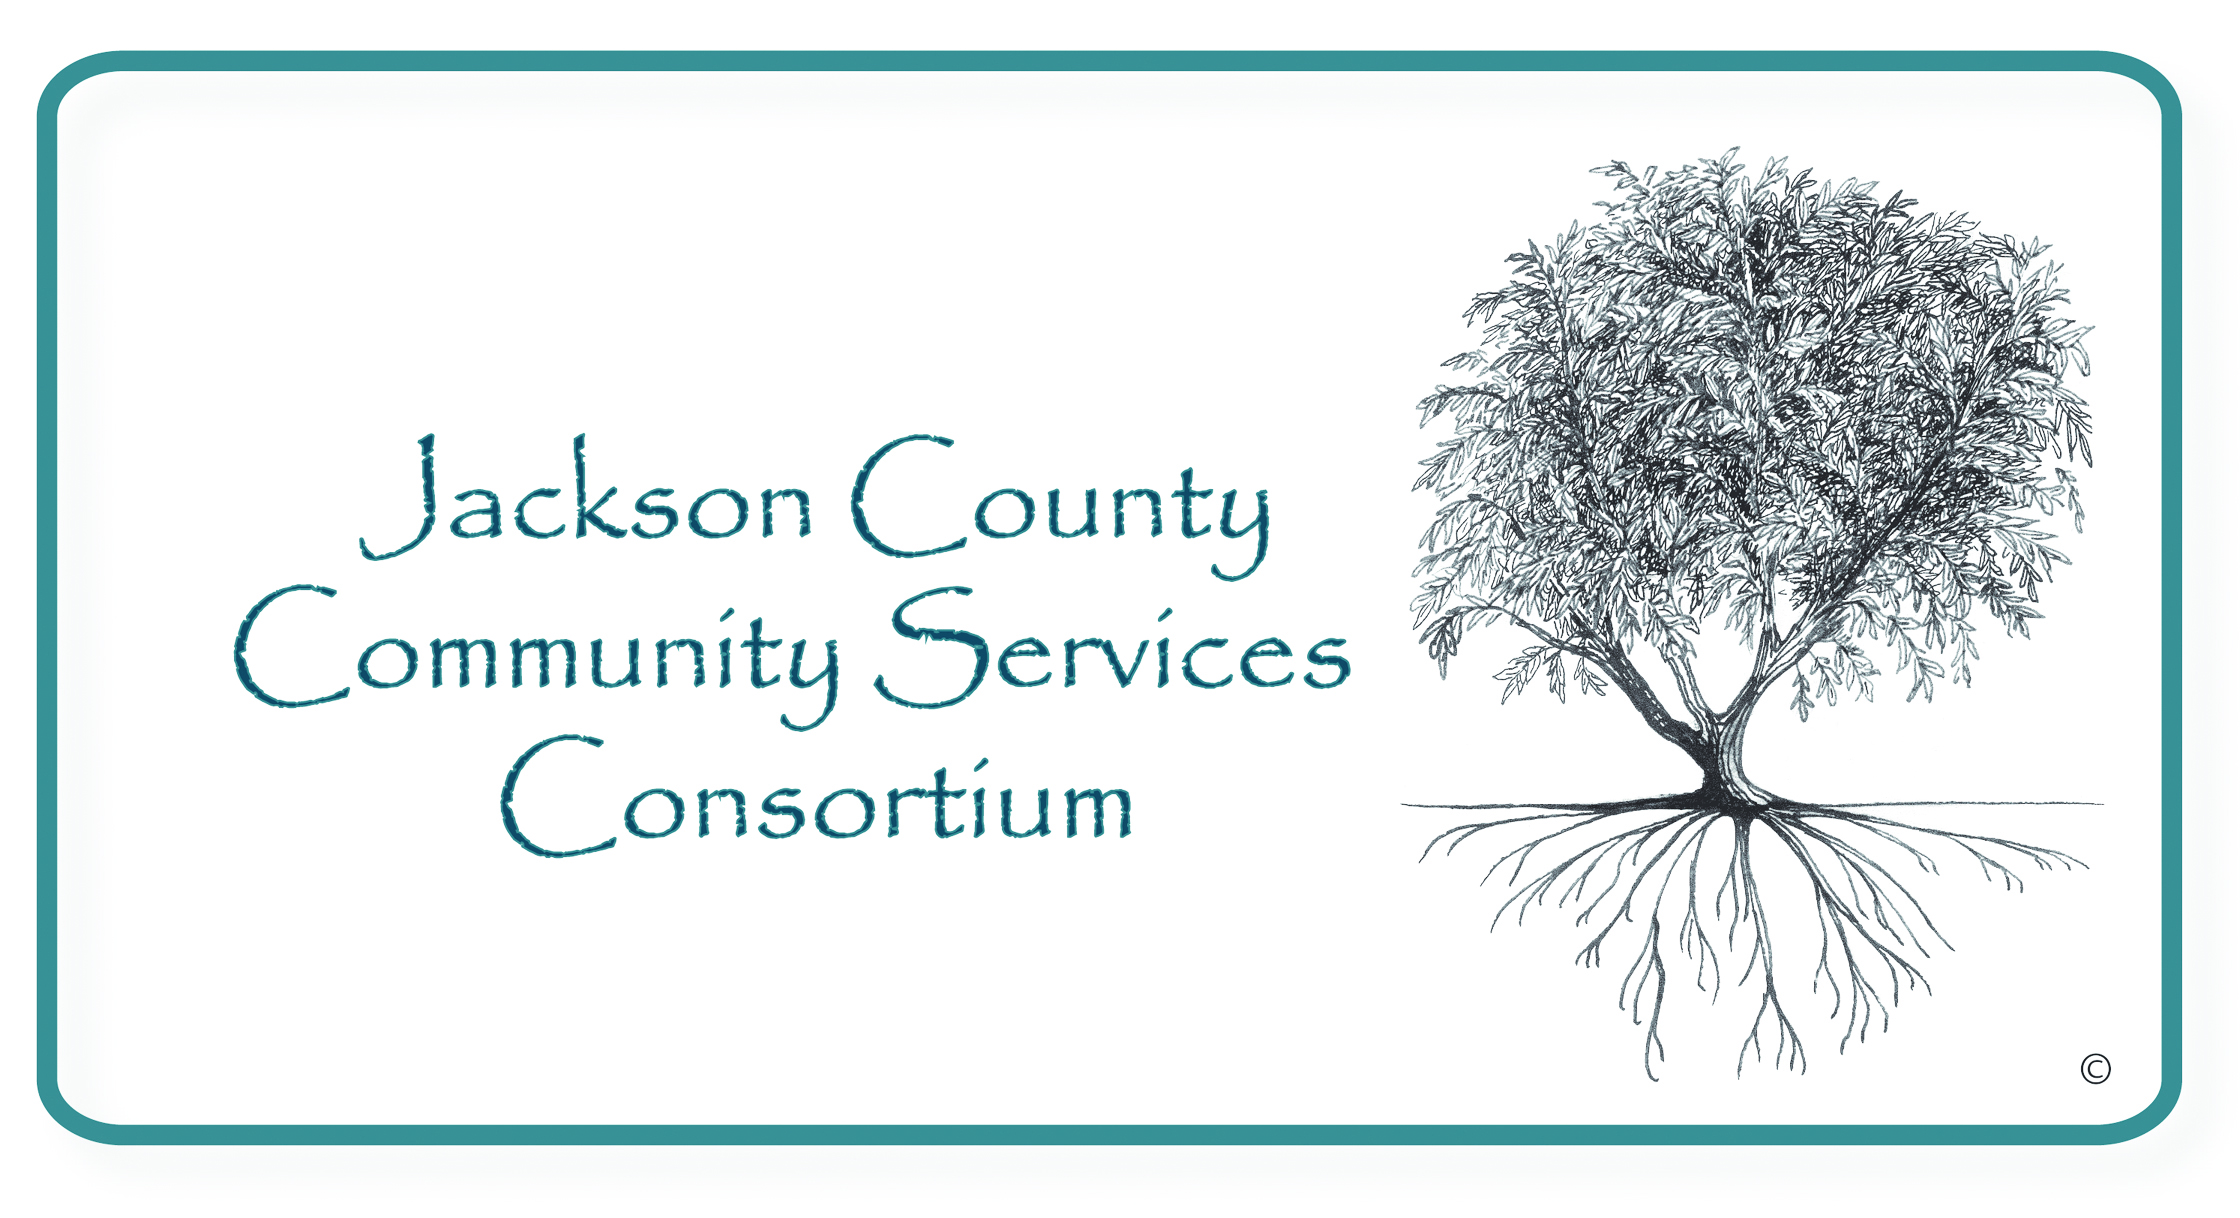 Jackson County Community Services Consortium